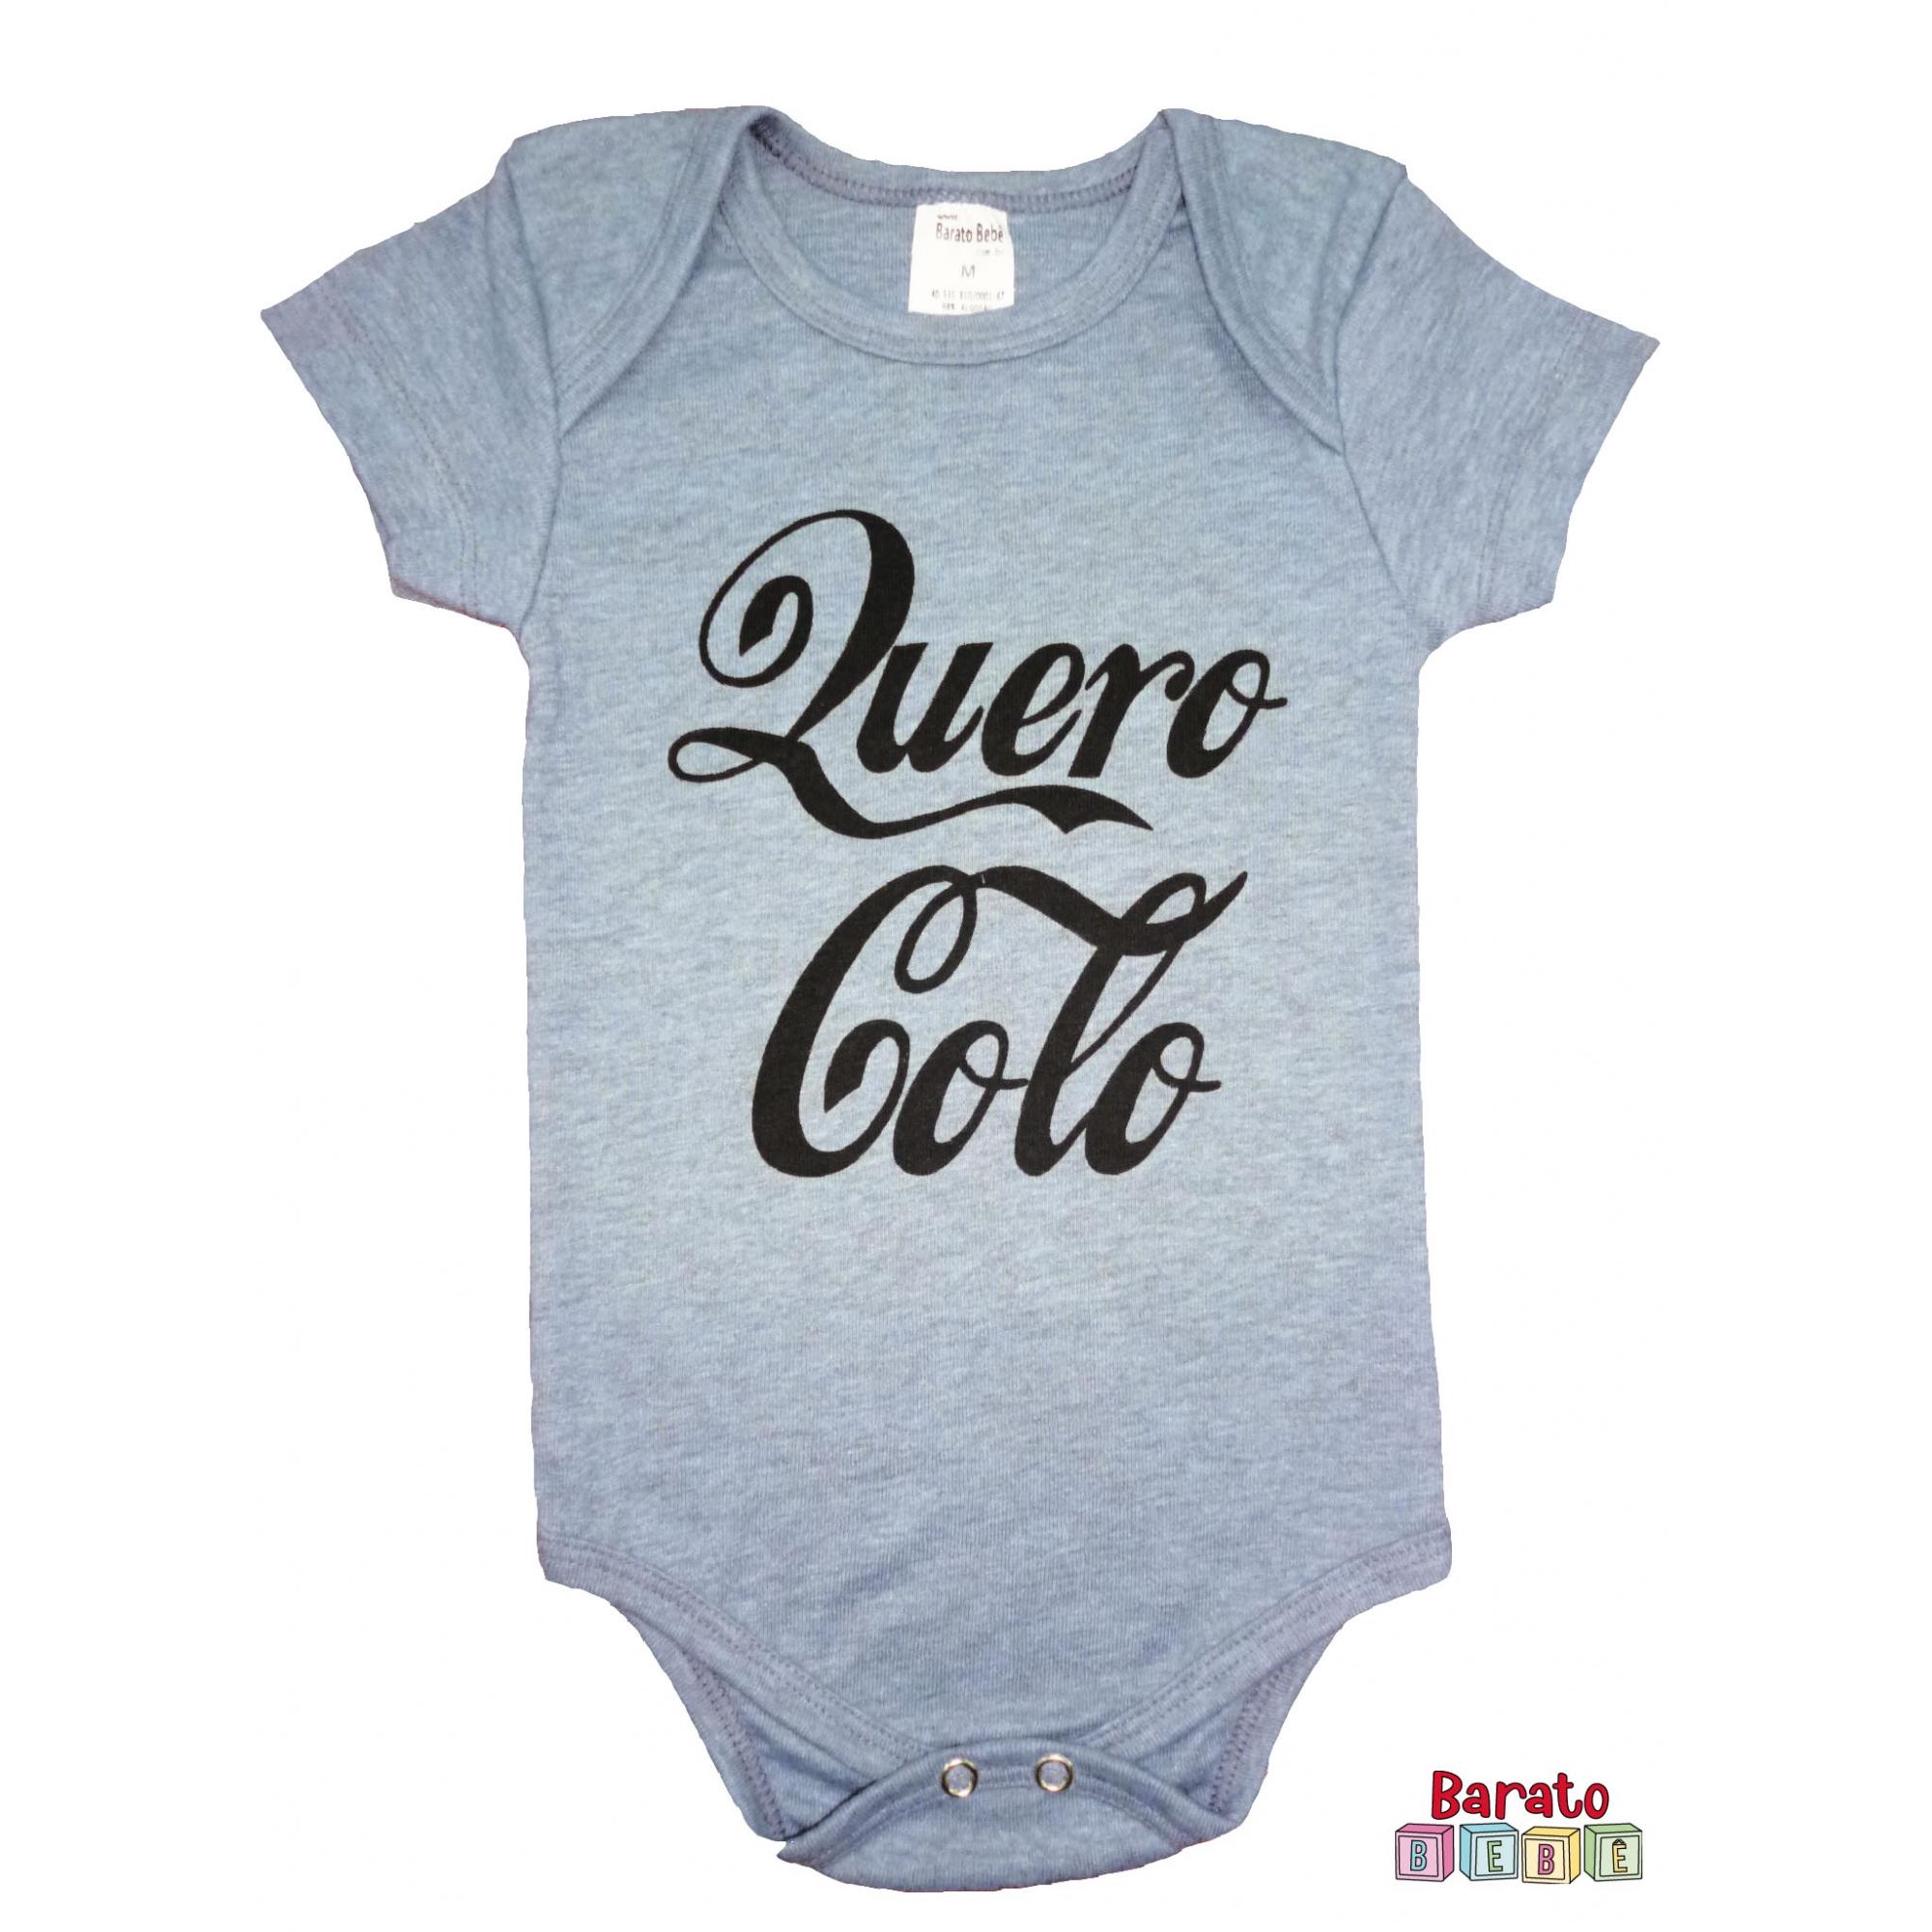 Body Bebê MC (P/M/G) - Quero Colo - Barato Bebê - Mescla Azul